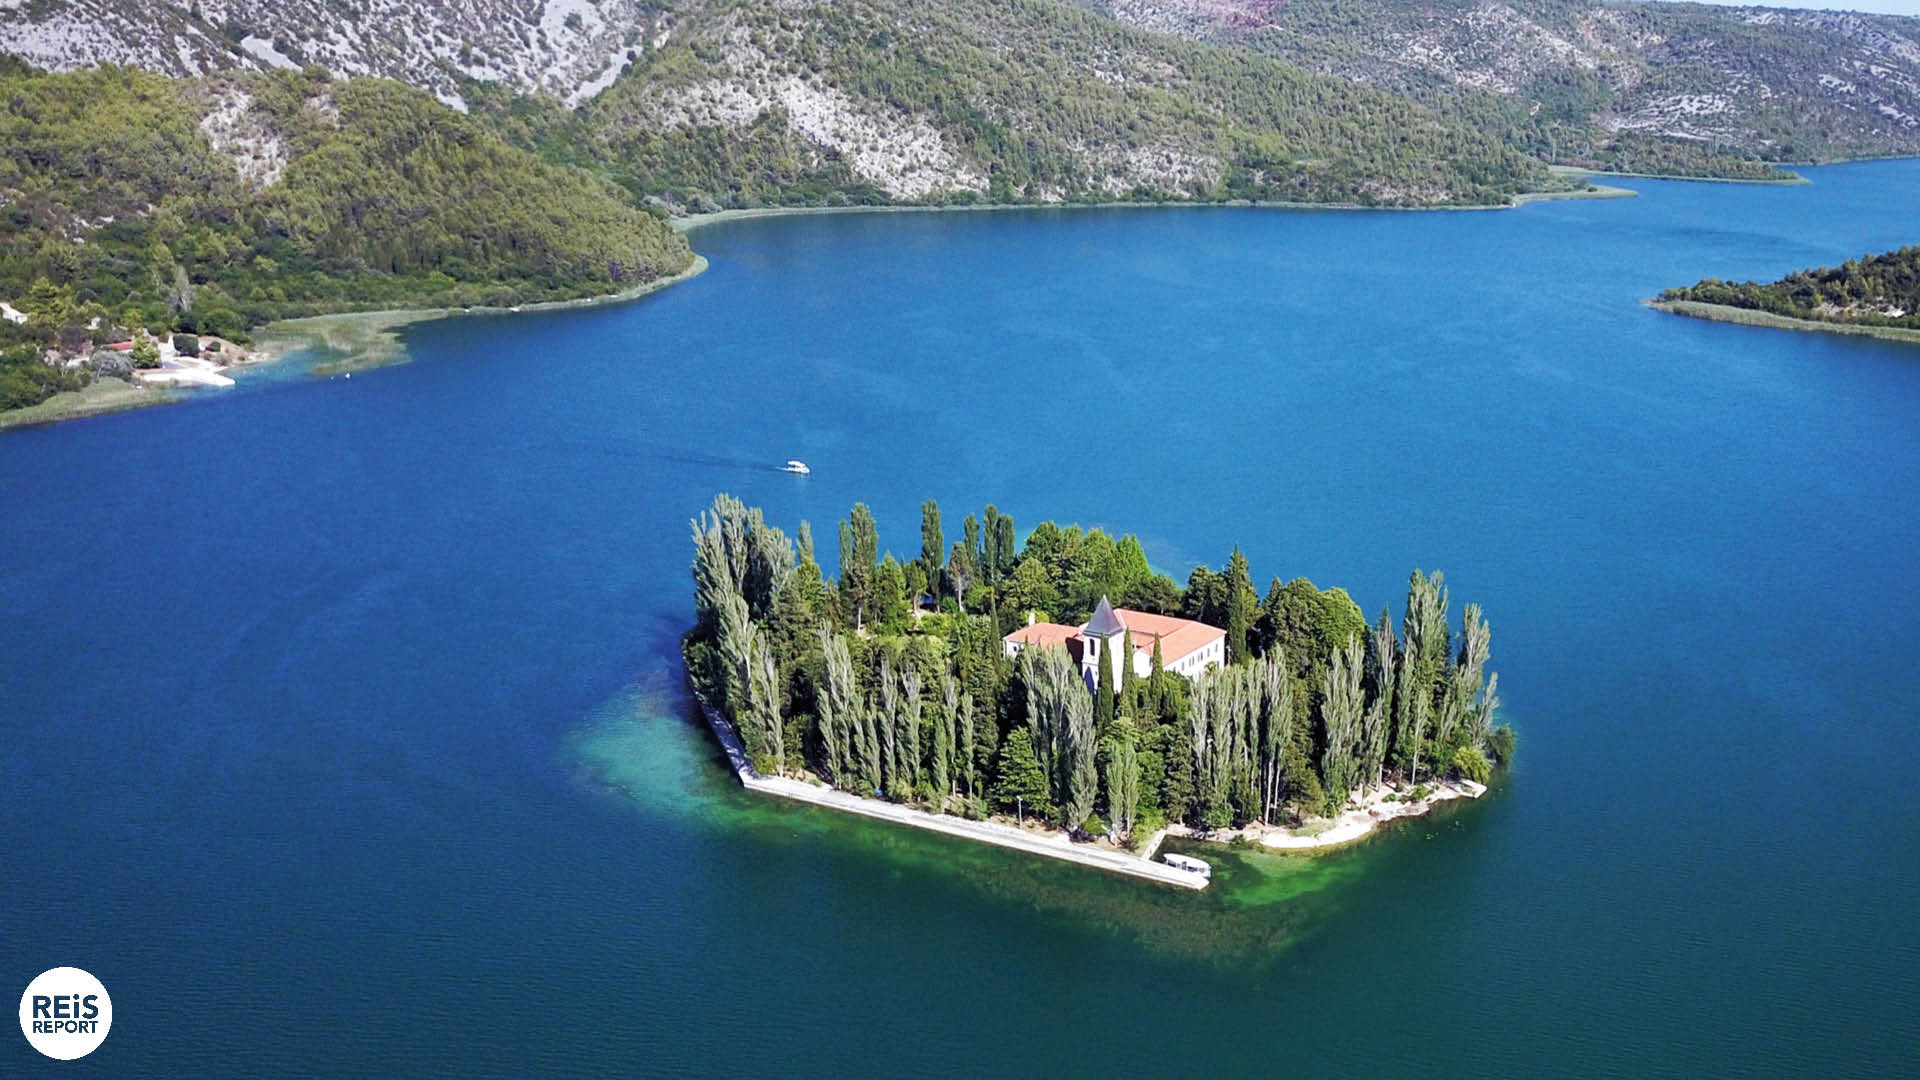 Visovac eiland